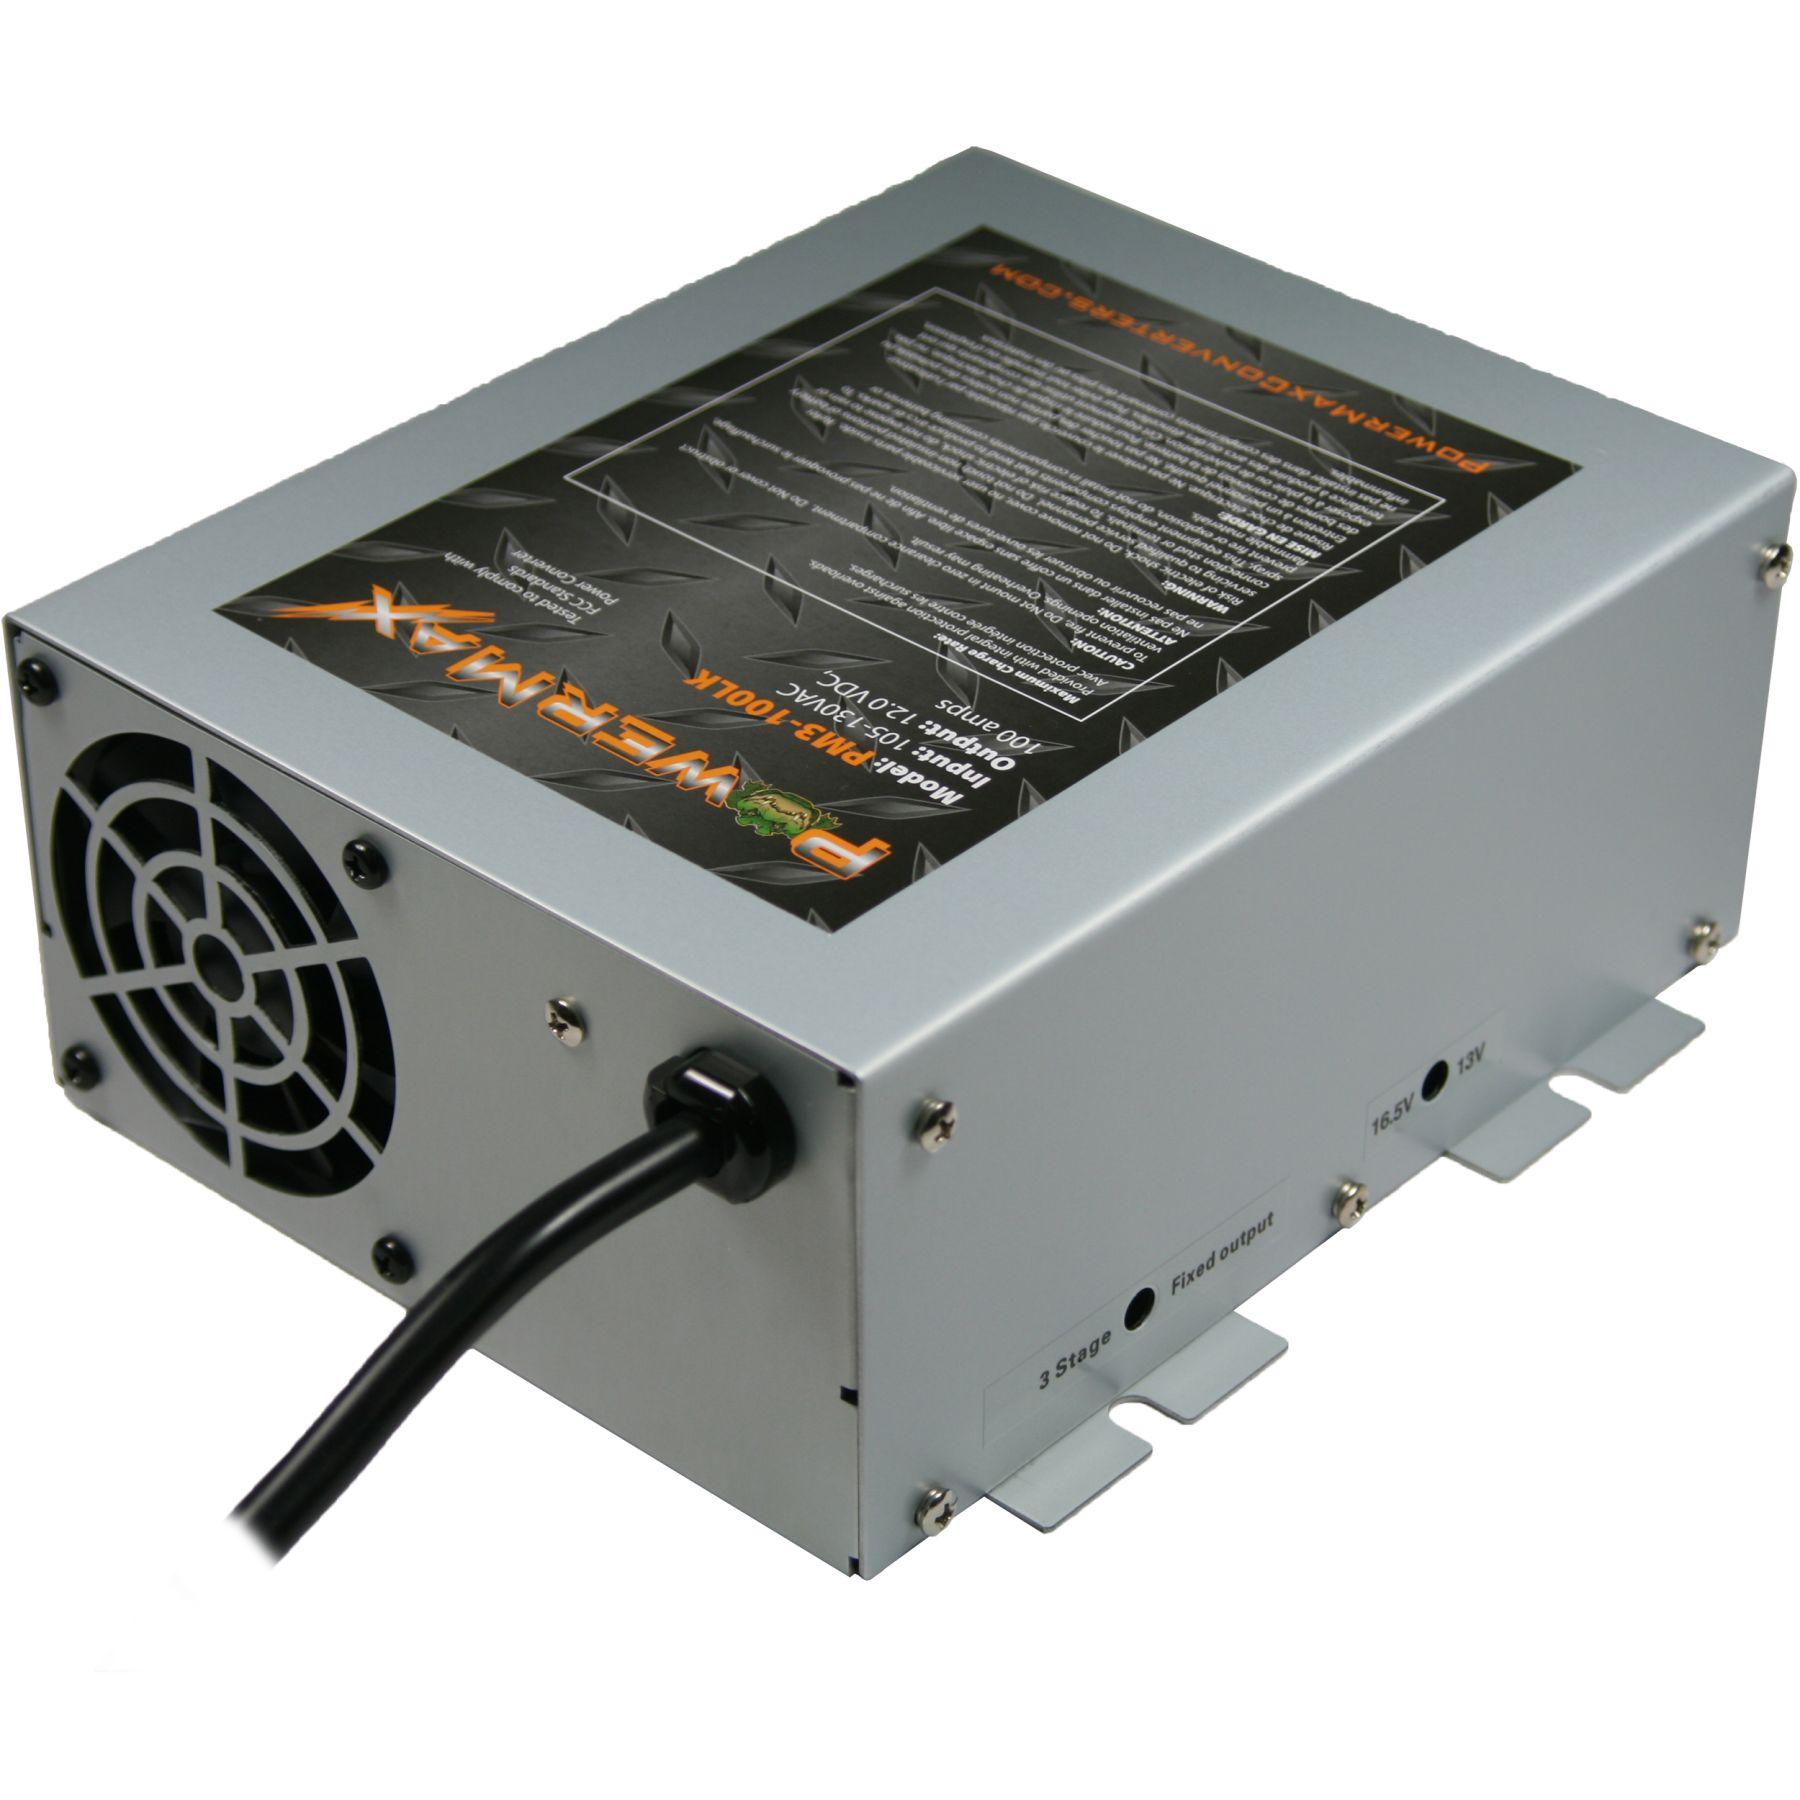 Pm3 100lk Powermax Converters 12v 100 Amp Charger Converter Powersupply